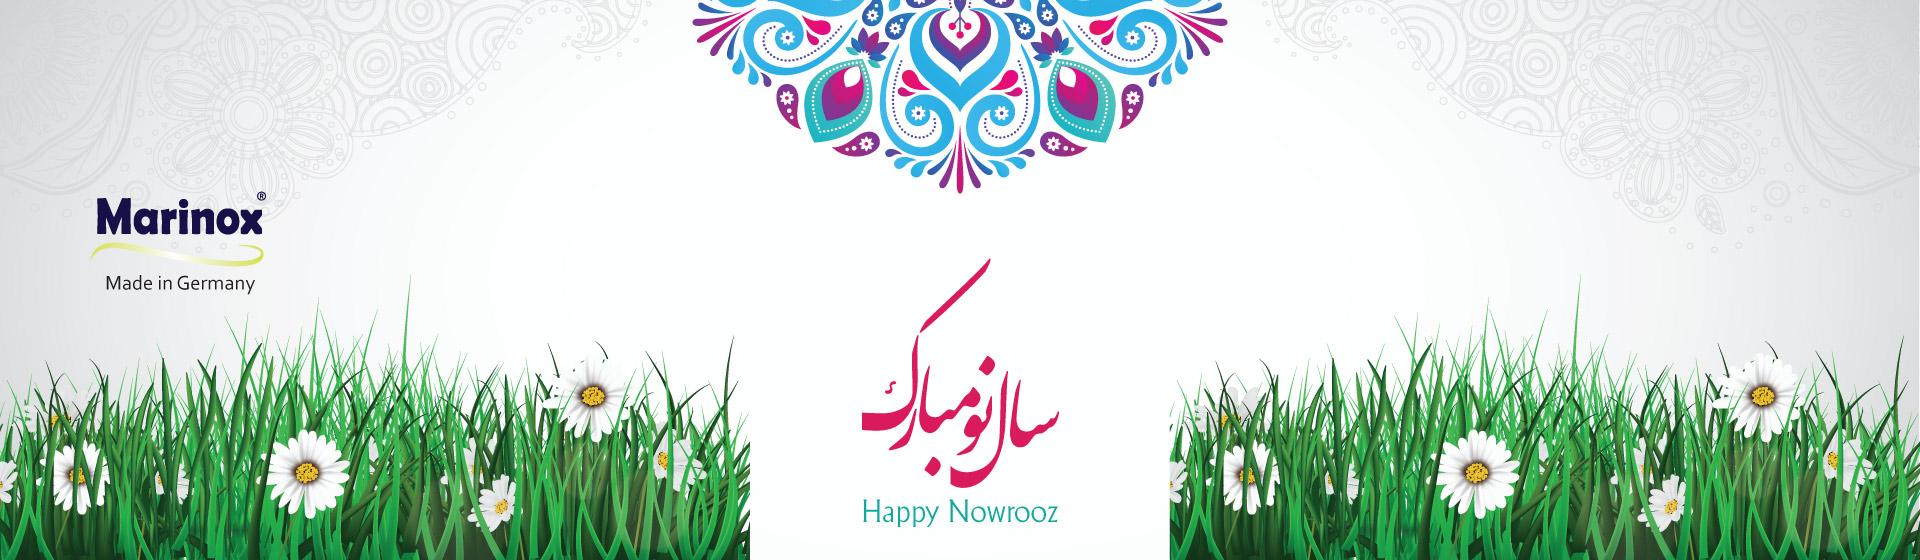 Happy-Nowrooz-marinox-26-12-98